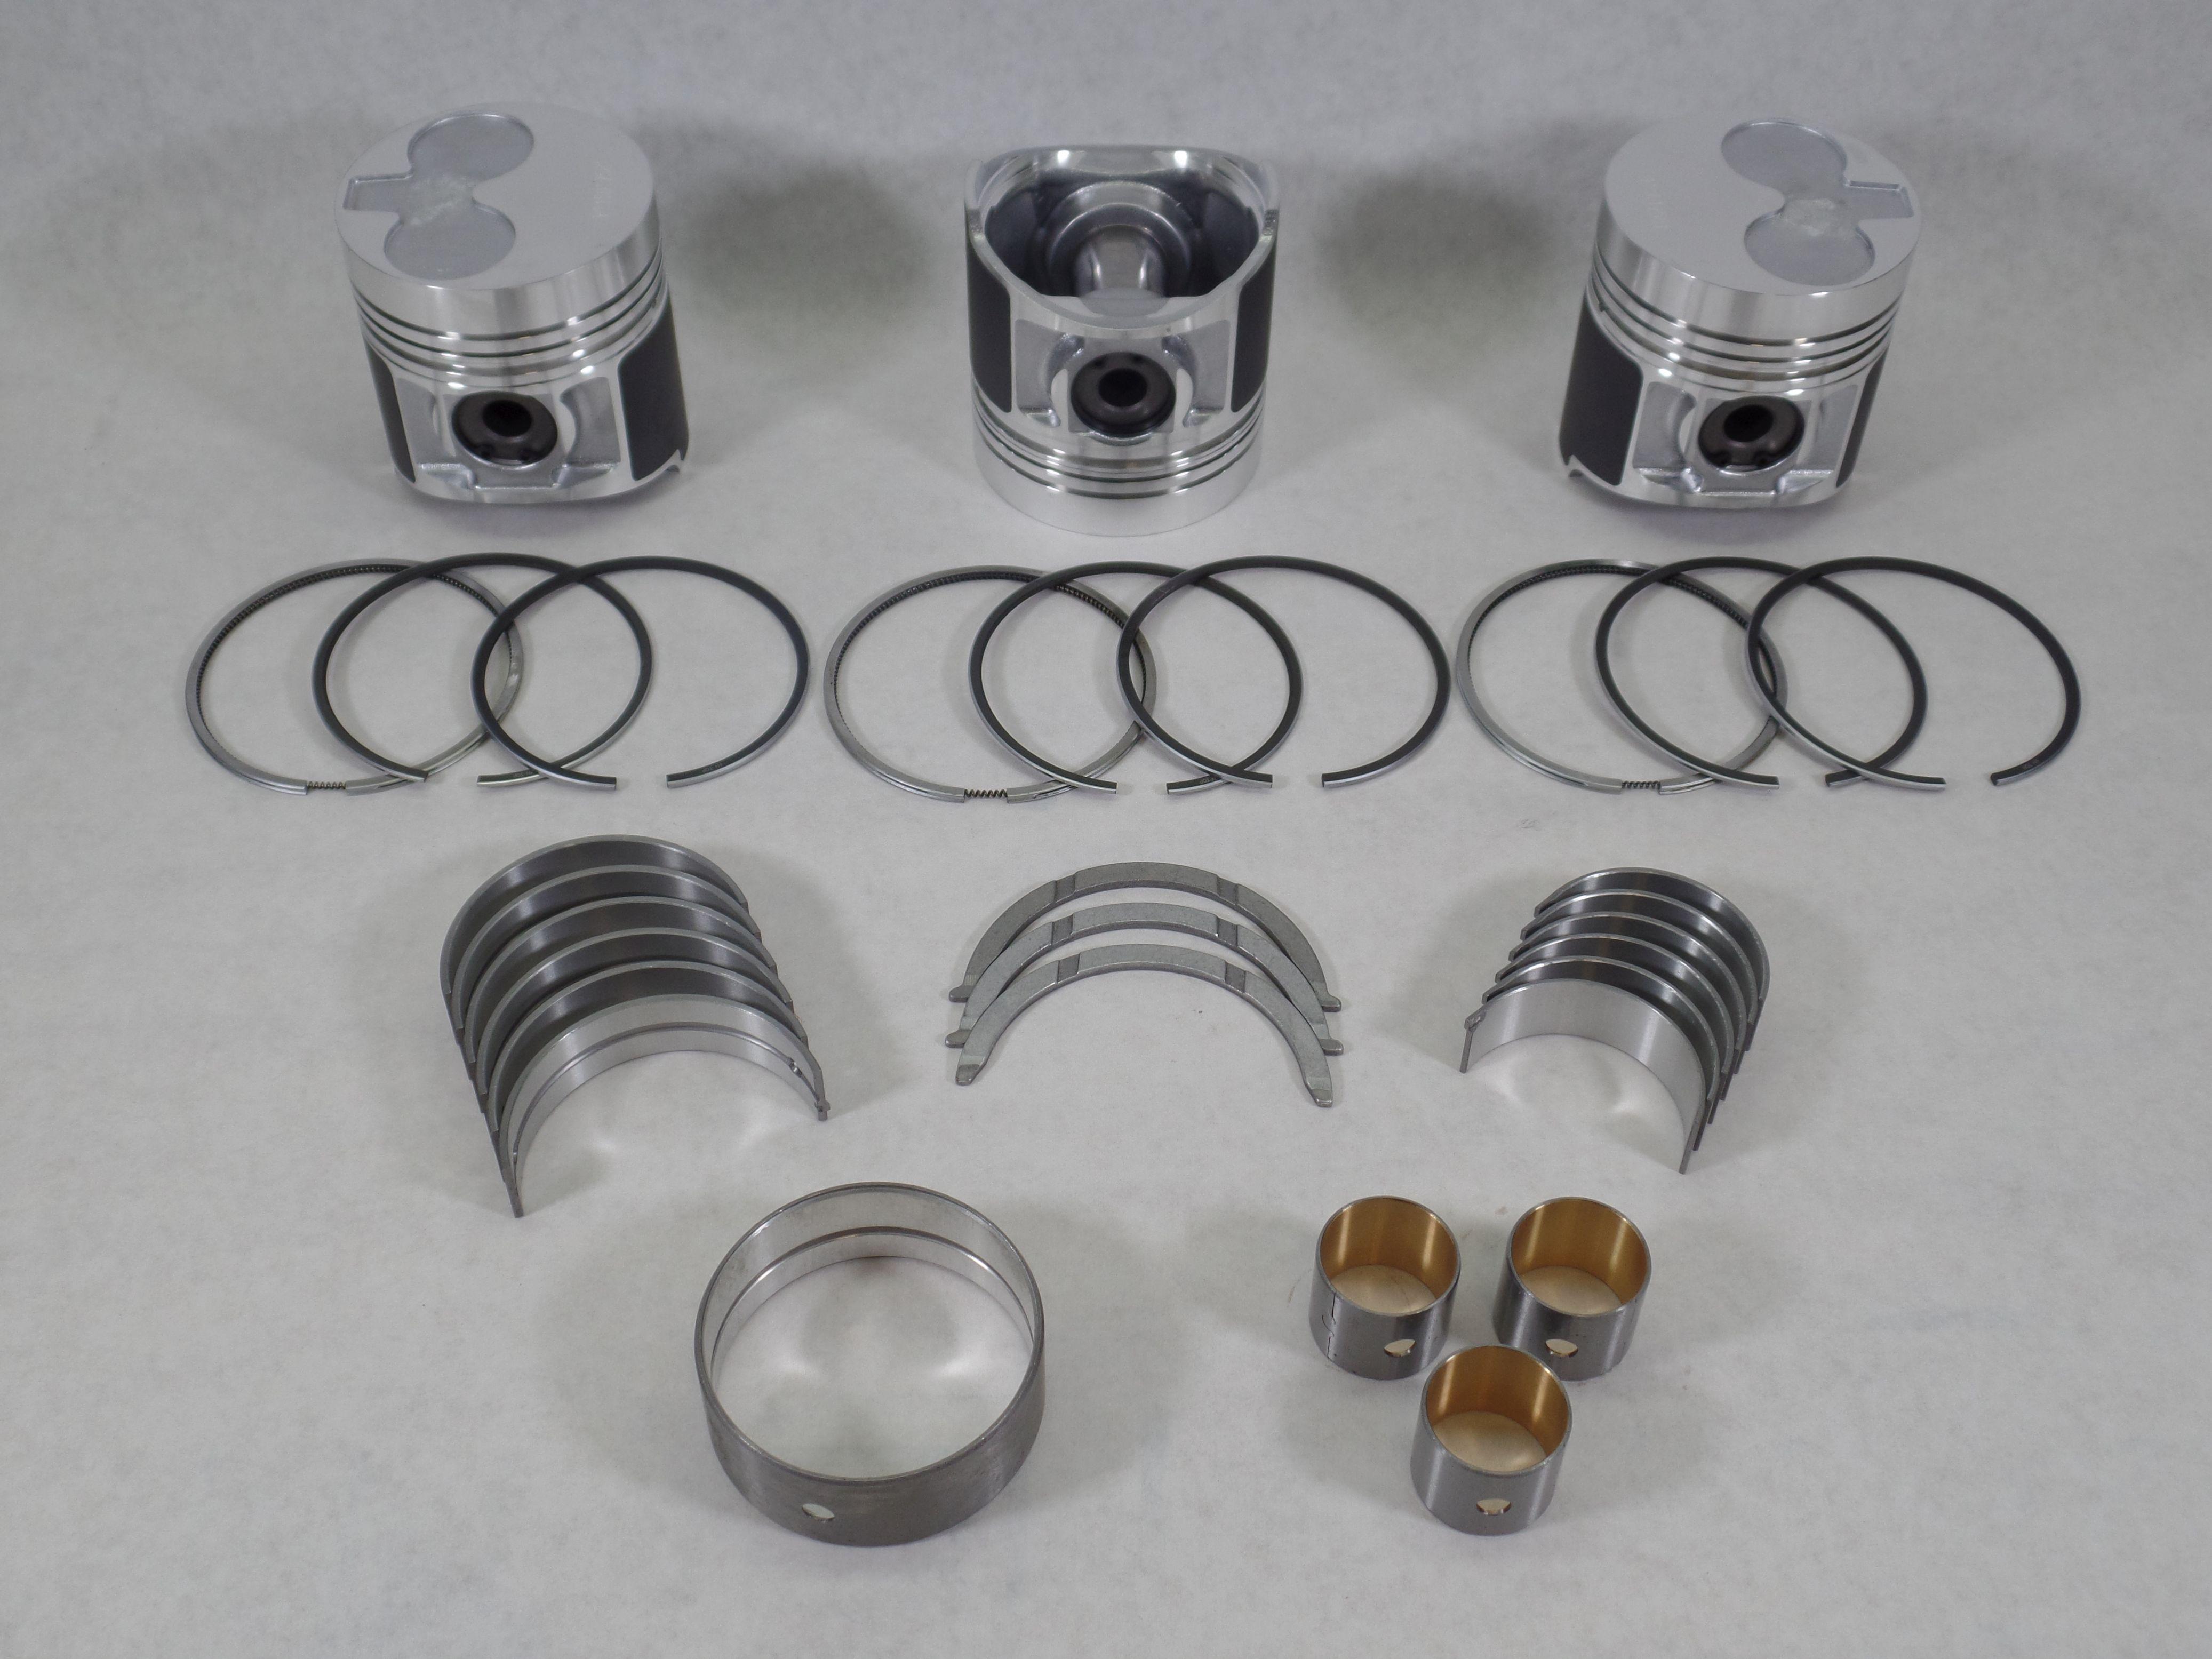 Shibaura Engine Overhaul Kits: R F Engine Fits Shibaura N832